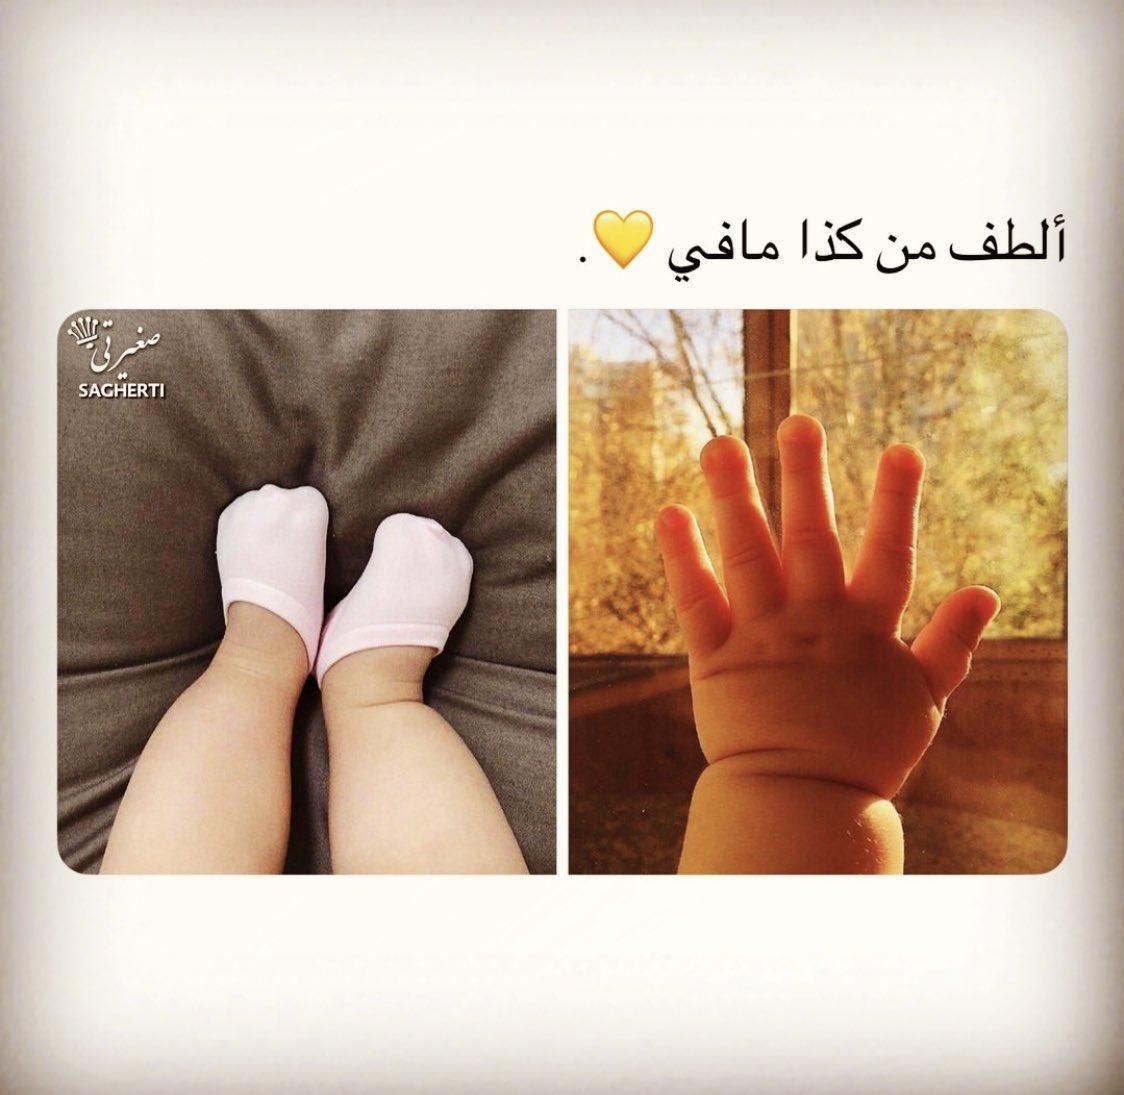 skye❤️'s photo on #ساعه_استجابه